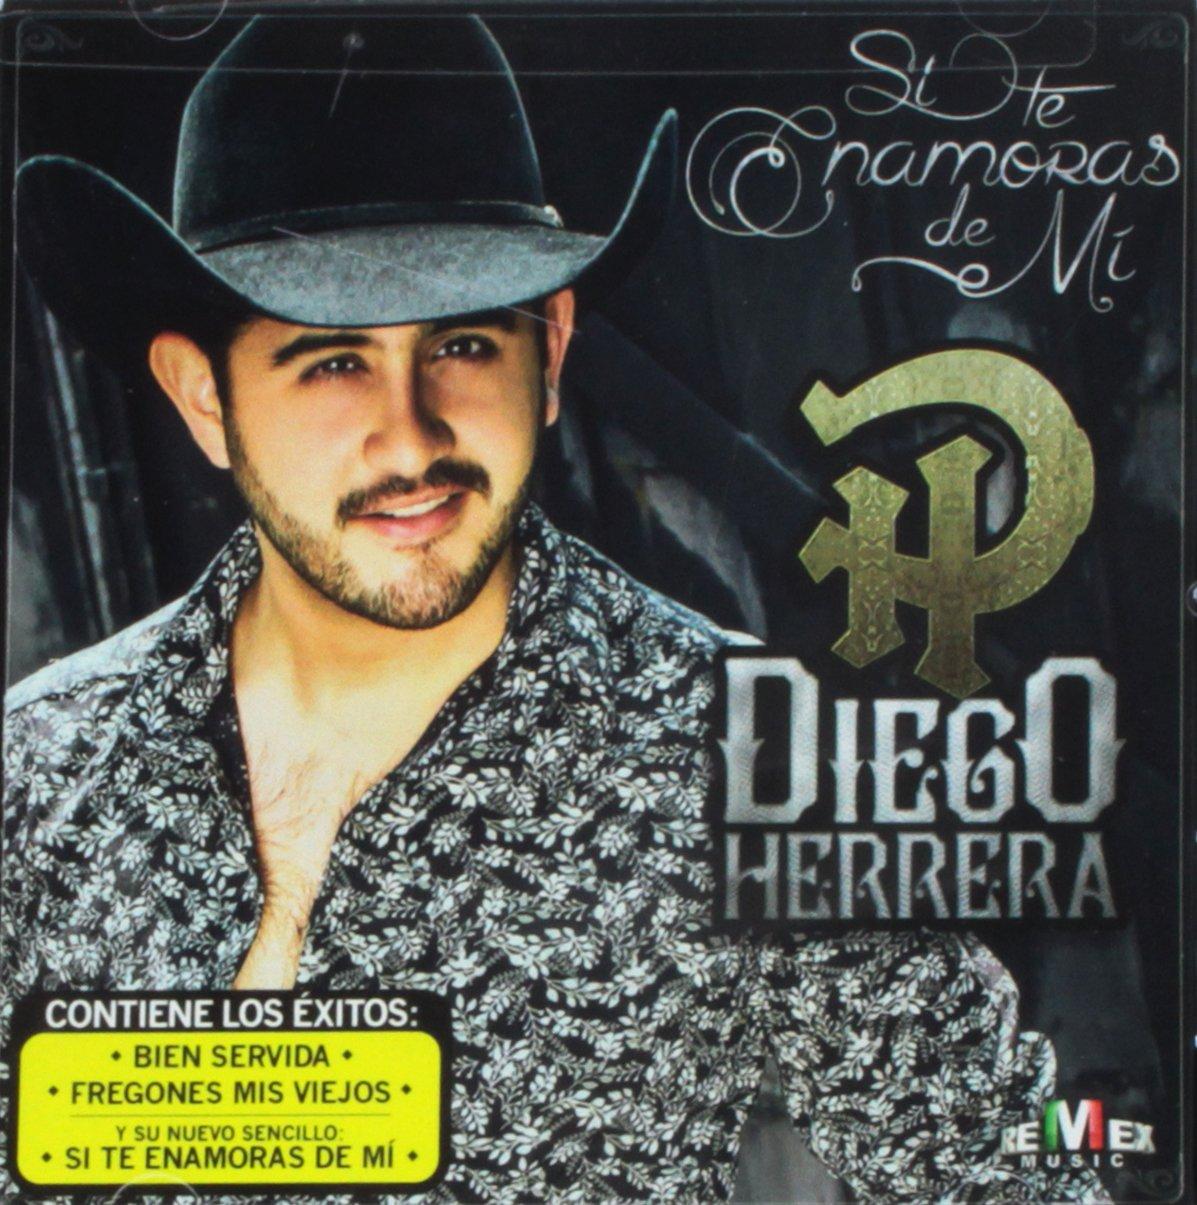 HERRERA DIEGO Translated Limited Special Price SI TE ENAMORAS MI DE